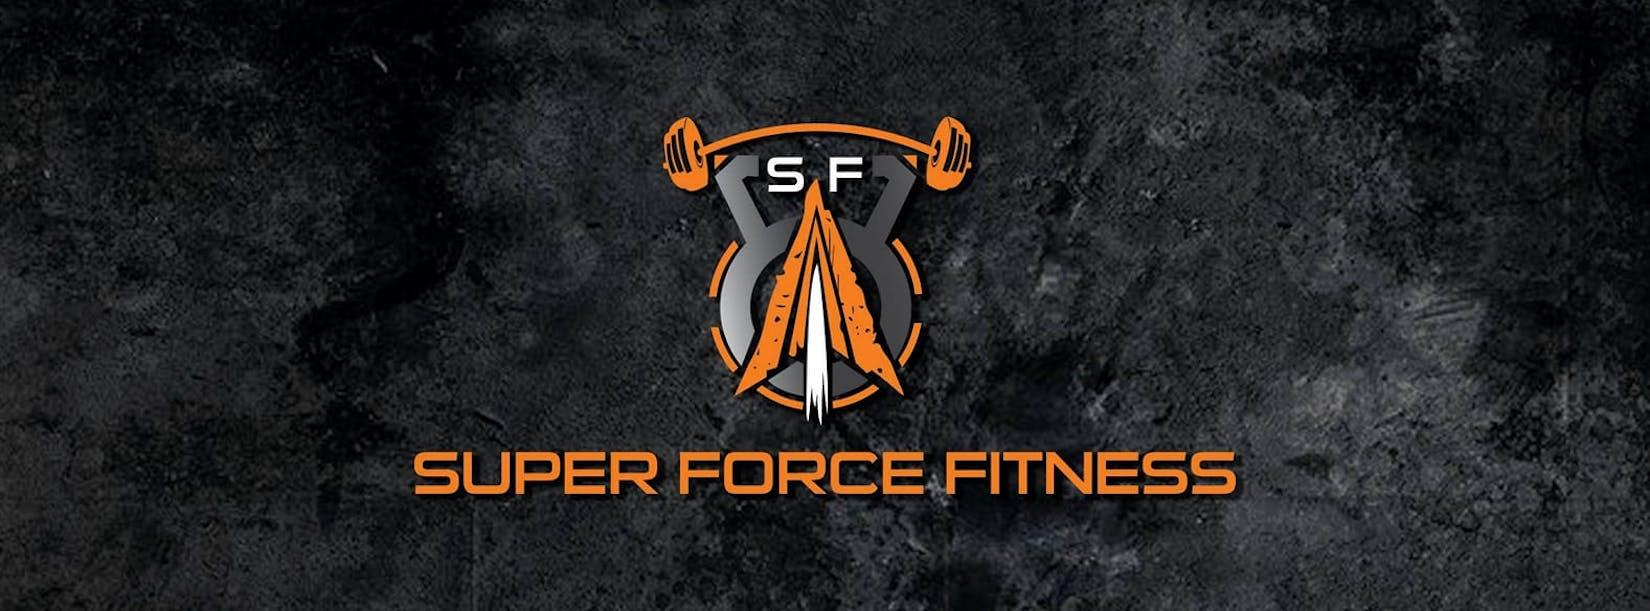 Super Force Fitness Club | Beauty